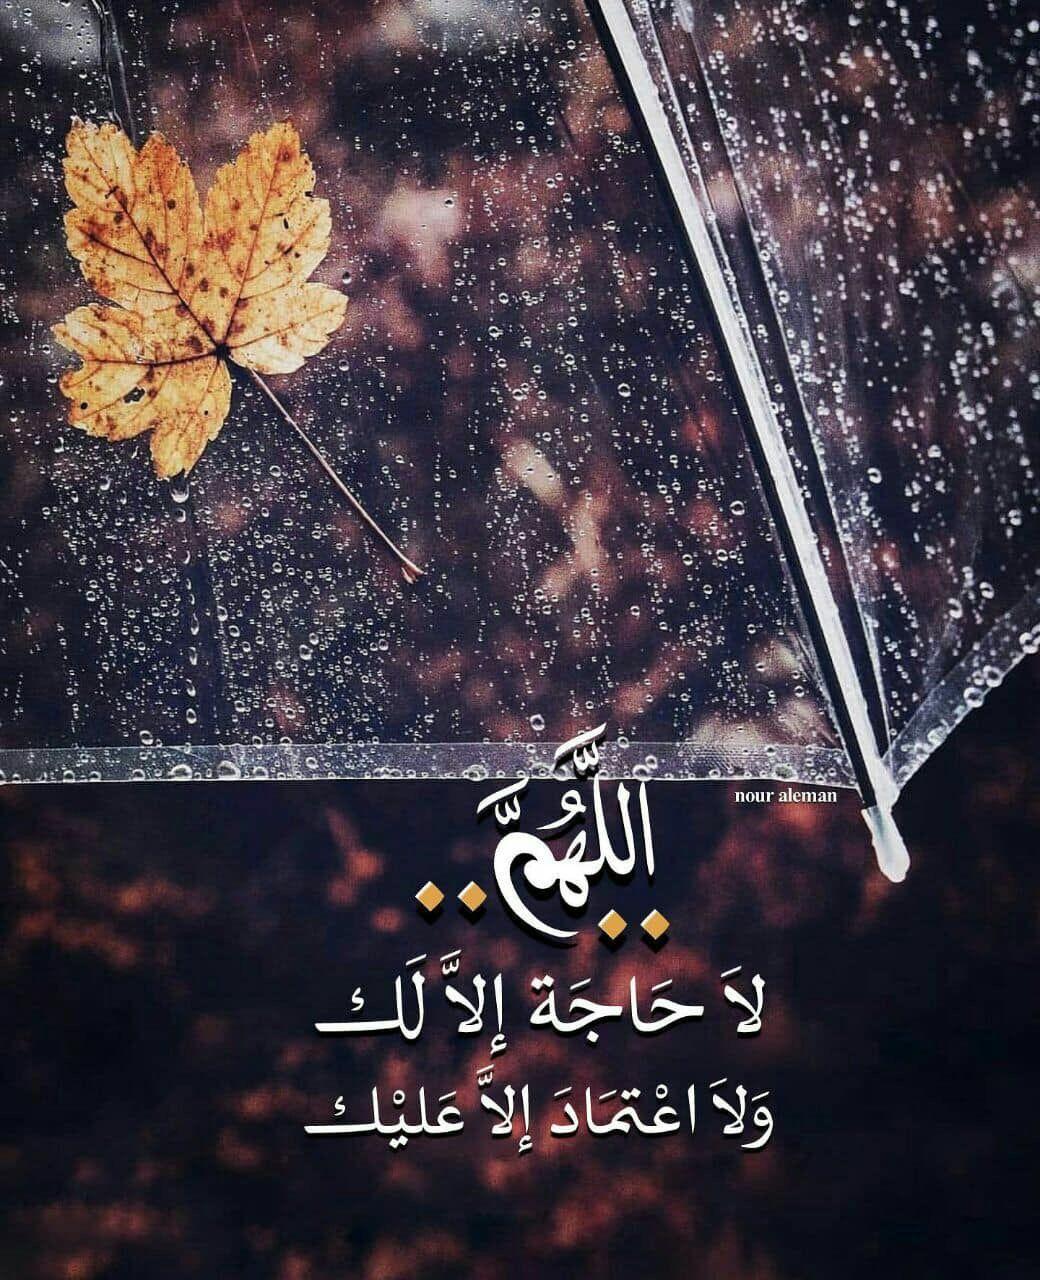 Pin By الأثر الجميل On دعاء Holy Quran Book Islam Facts Quran